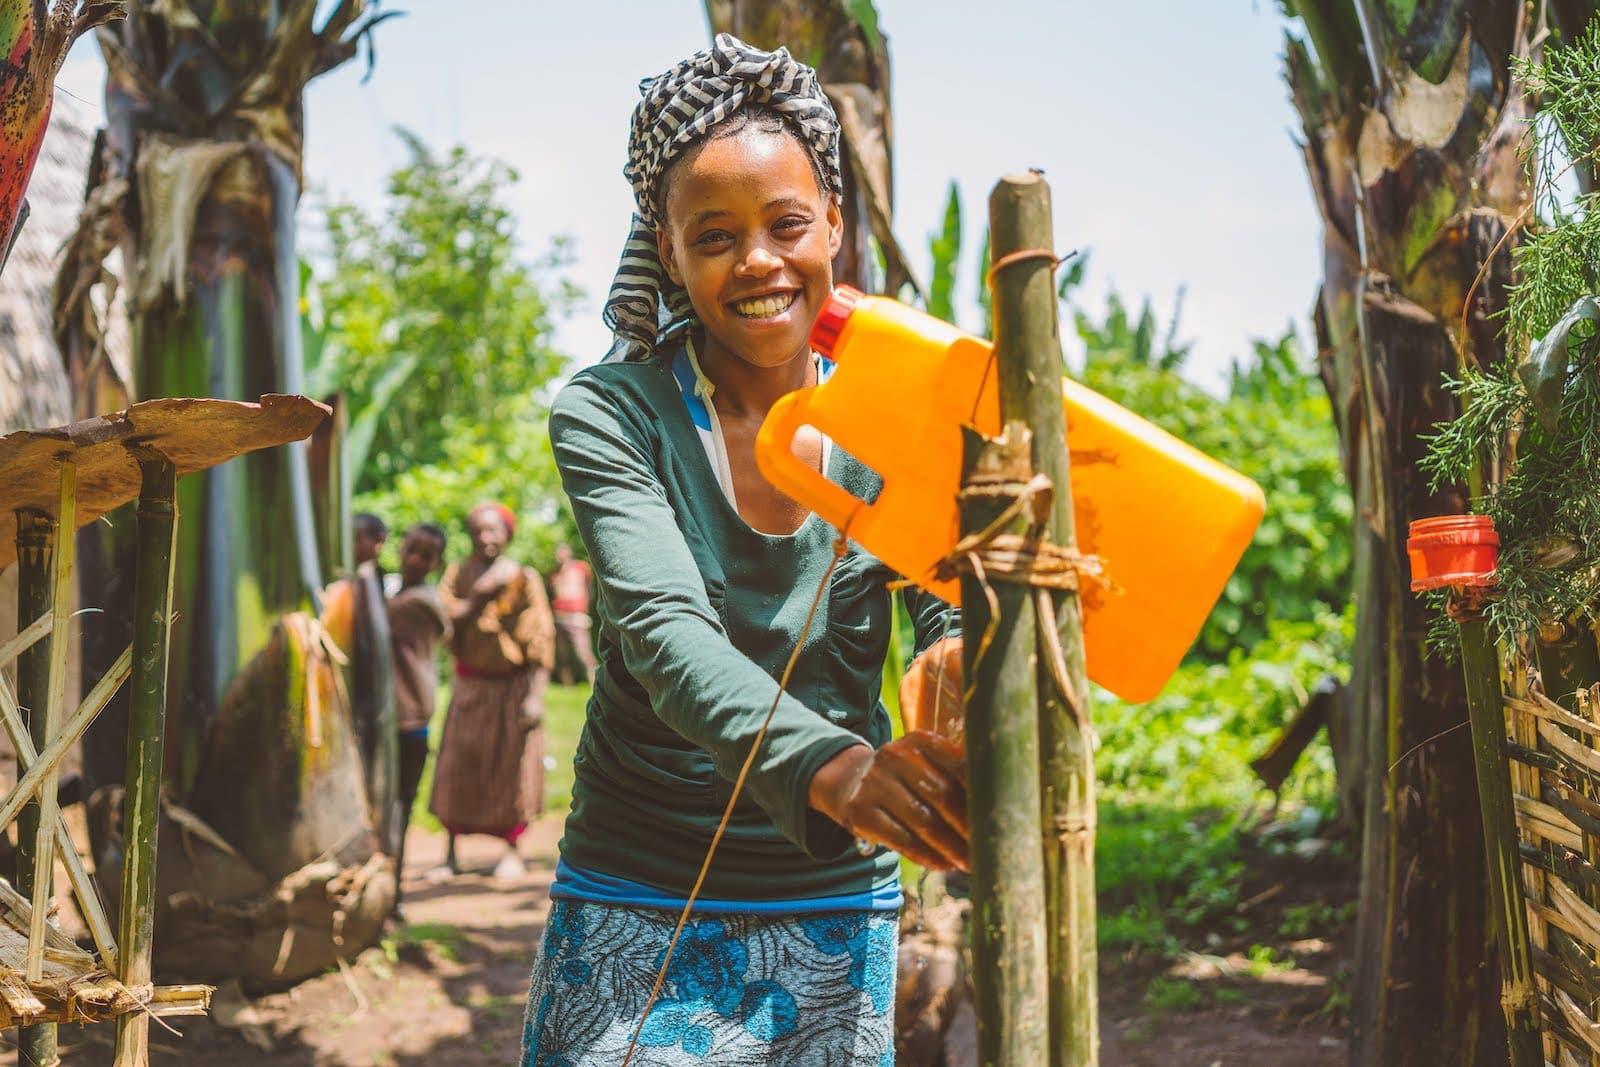 ethiopia water crisis